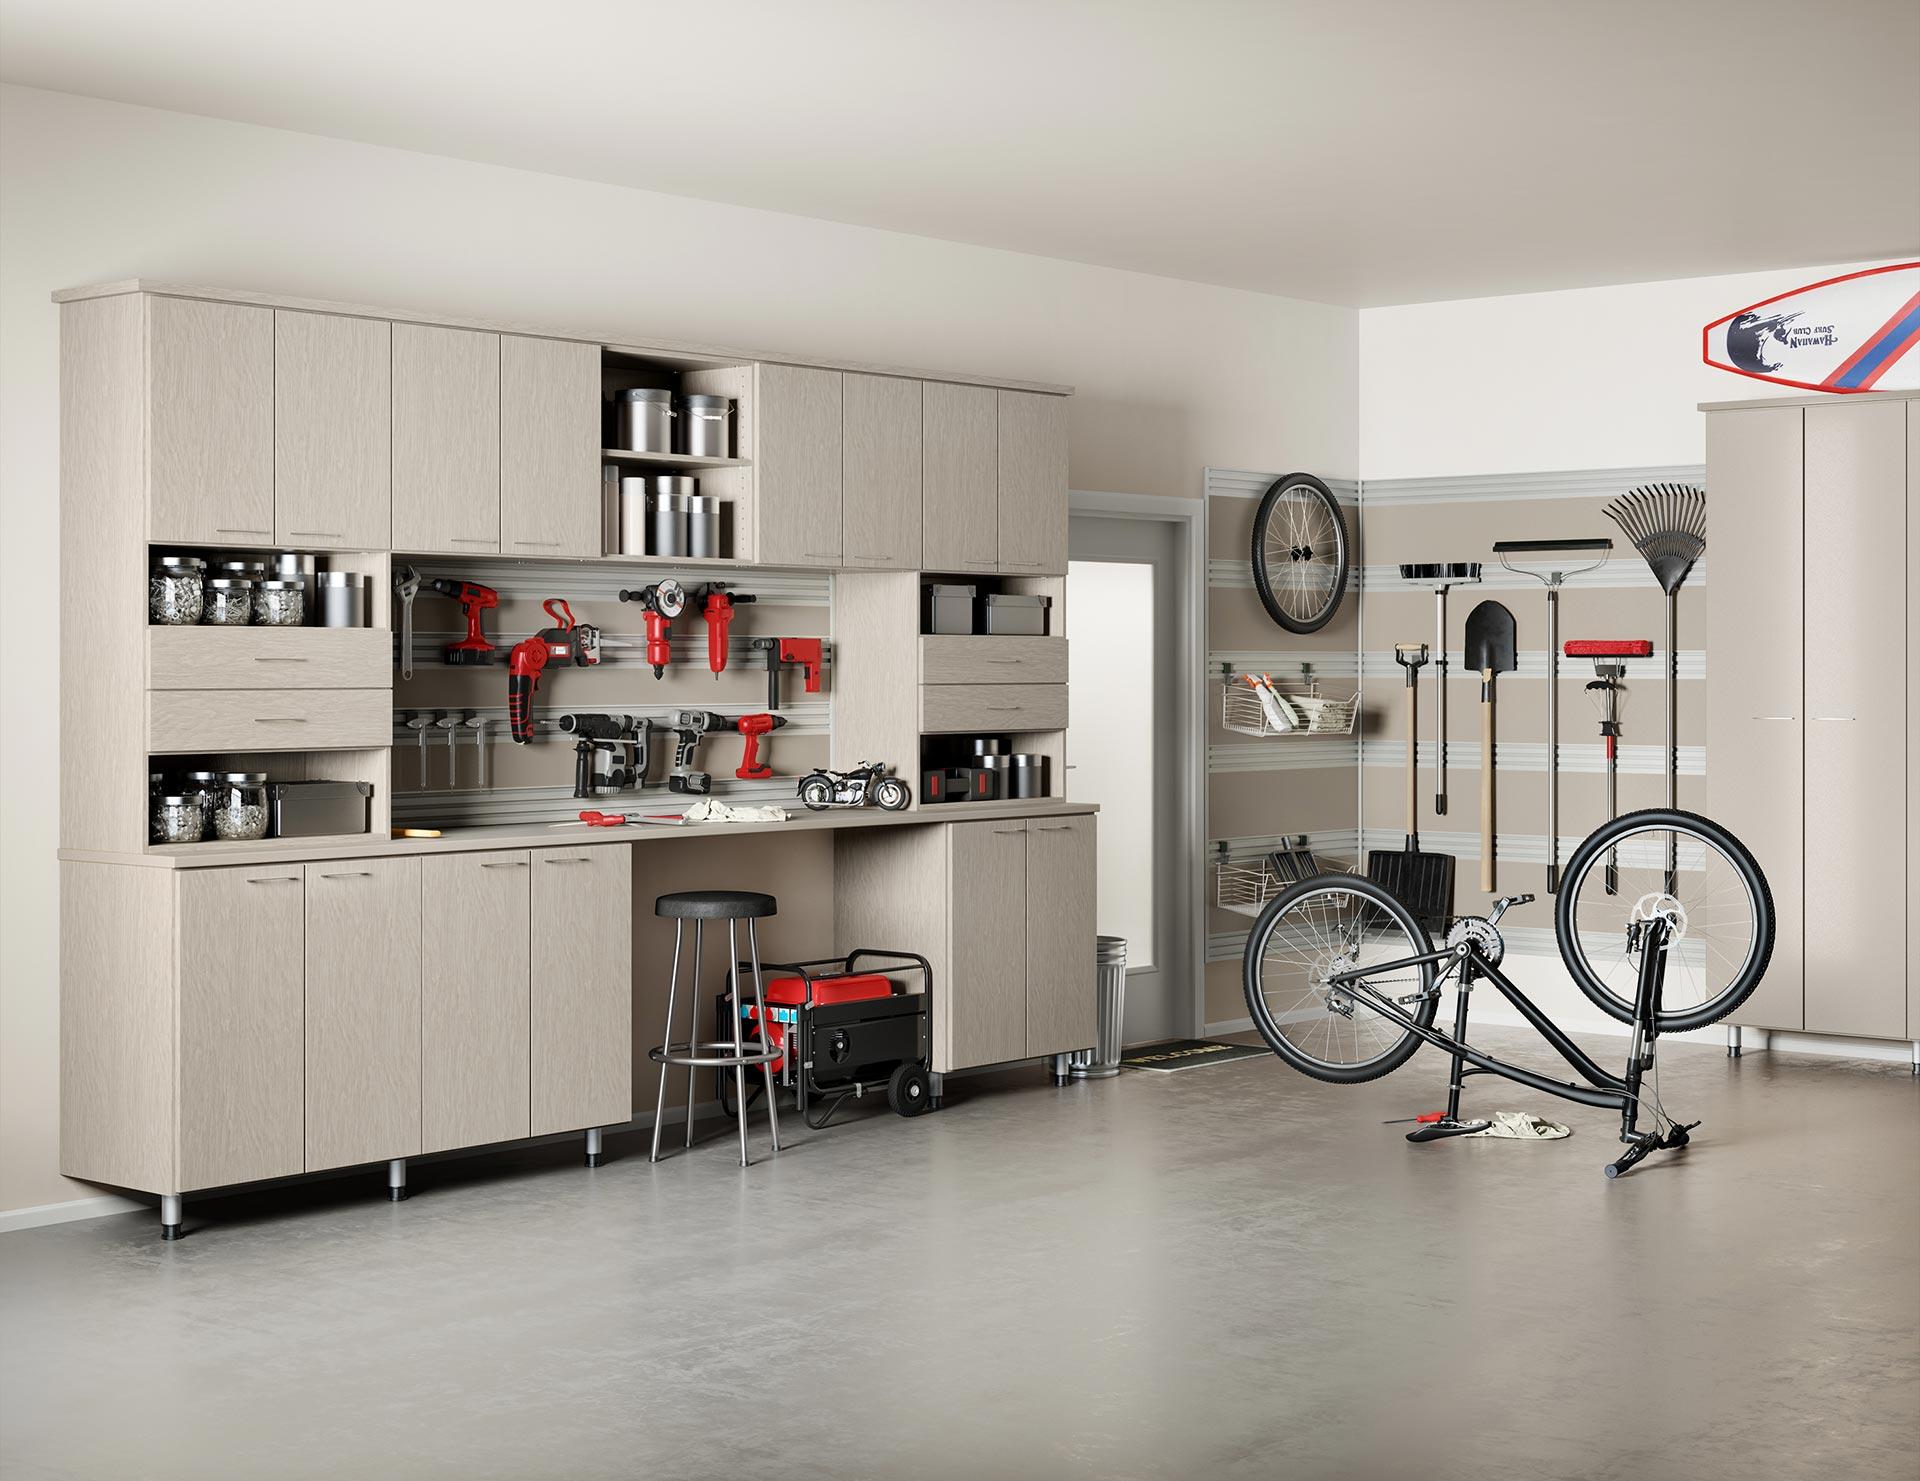 Garage Storage Cabinets Organization Systems California